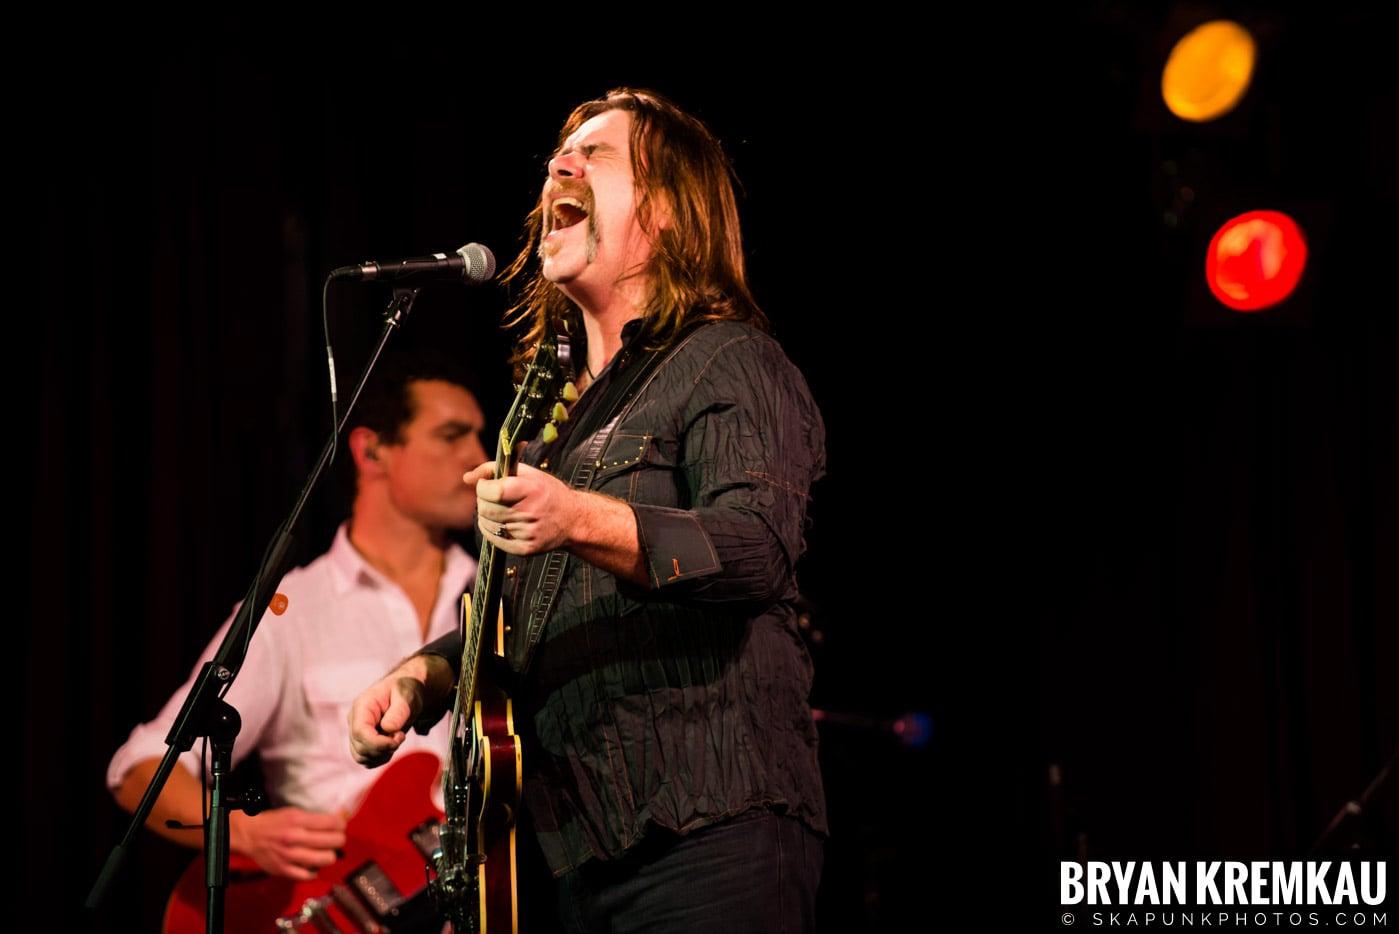 Alan Doyle @ B.B. King Blues & Grill, NYC - 1.11.13 (3)